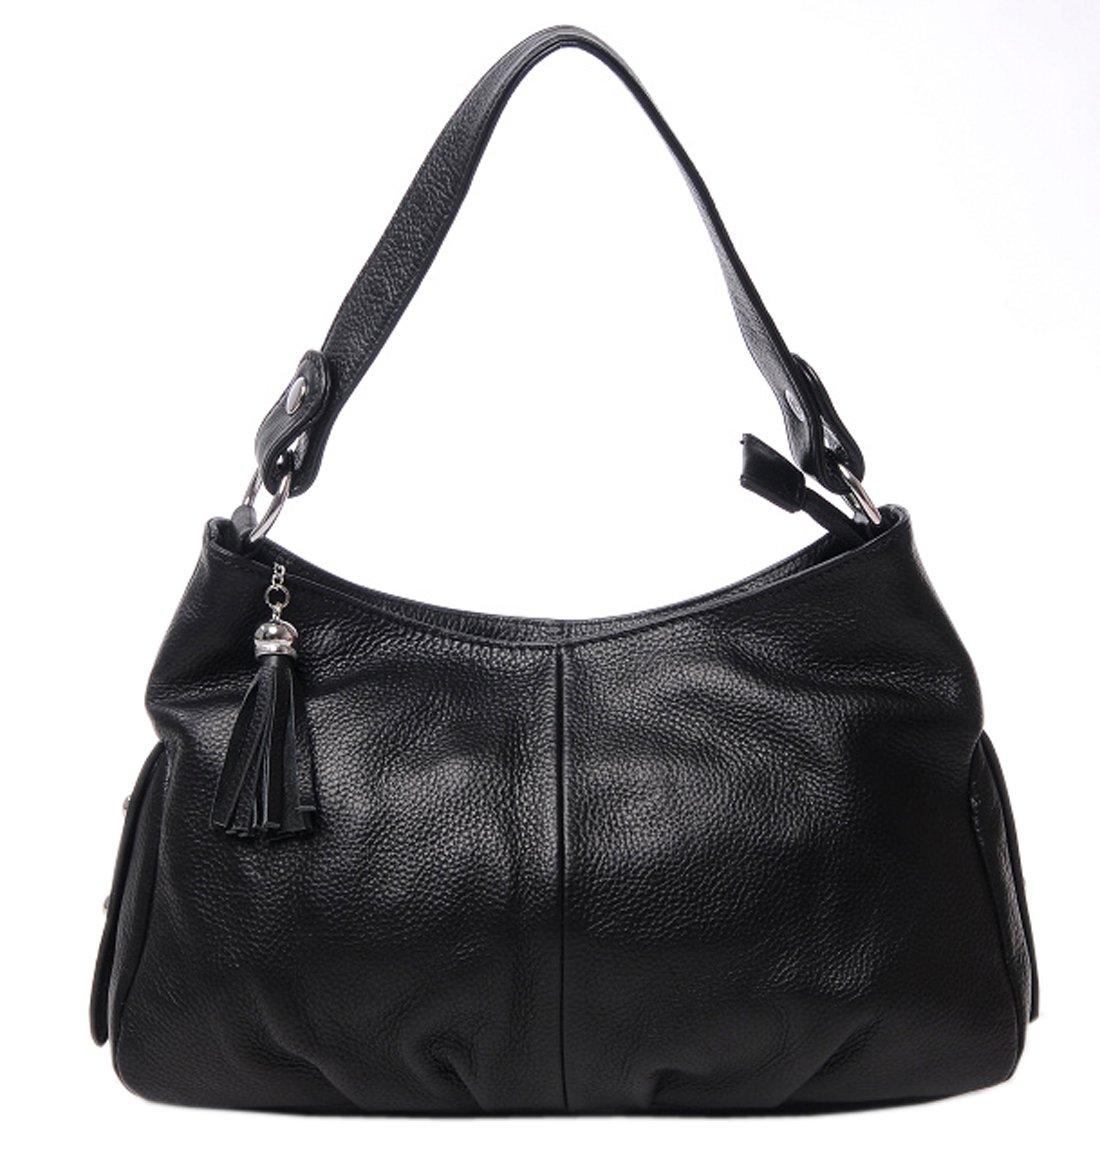 SAIERLONG Women's Tote Single Shoulder Bag Black Genuine Leather